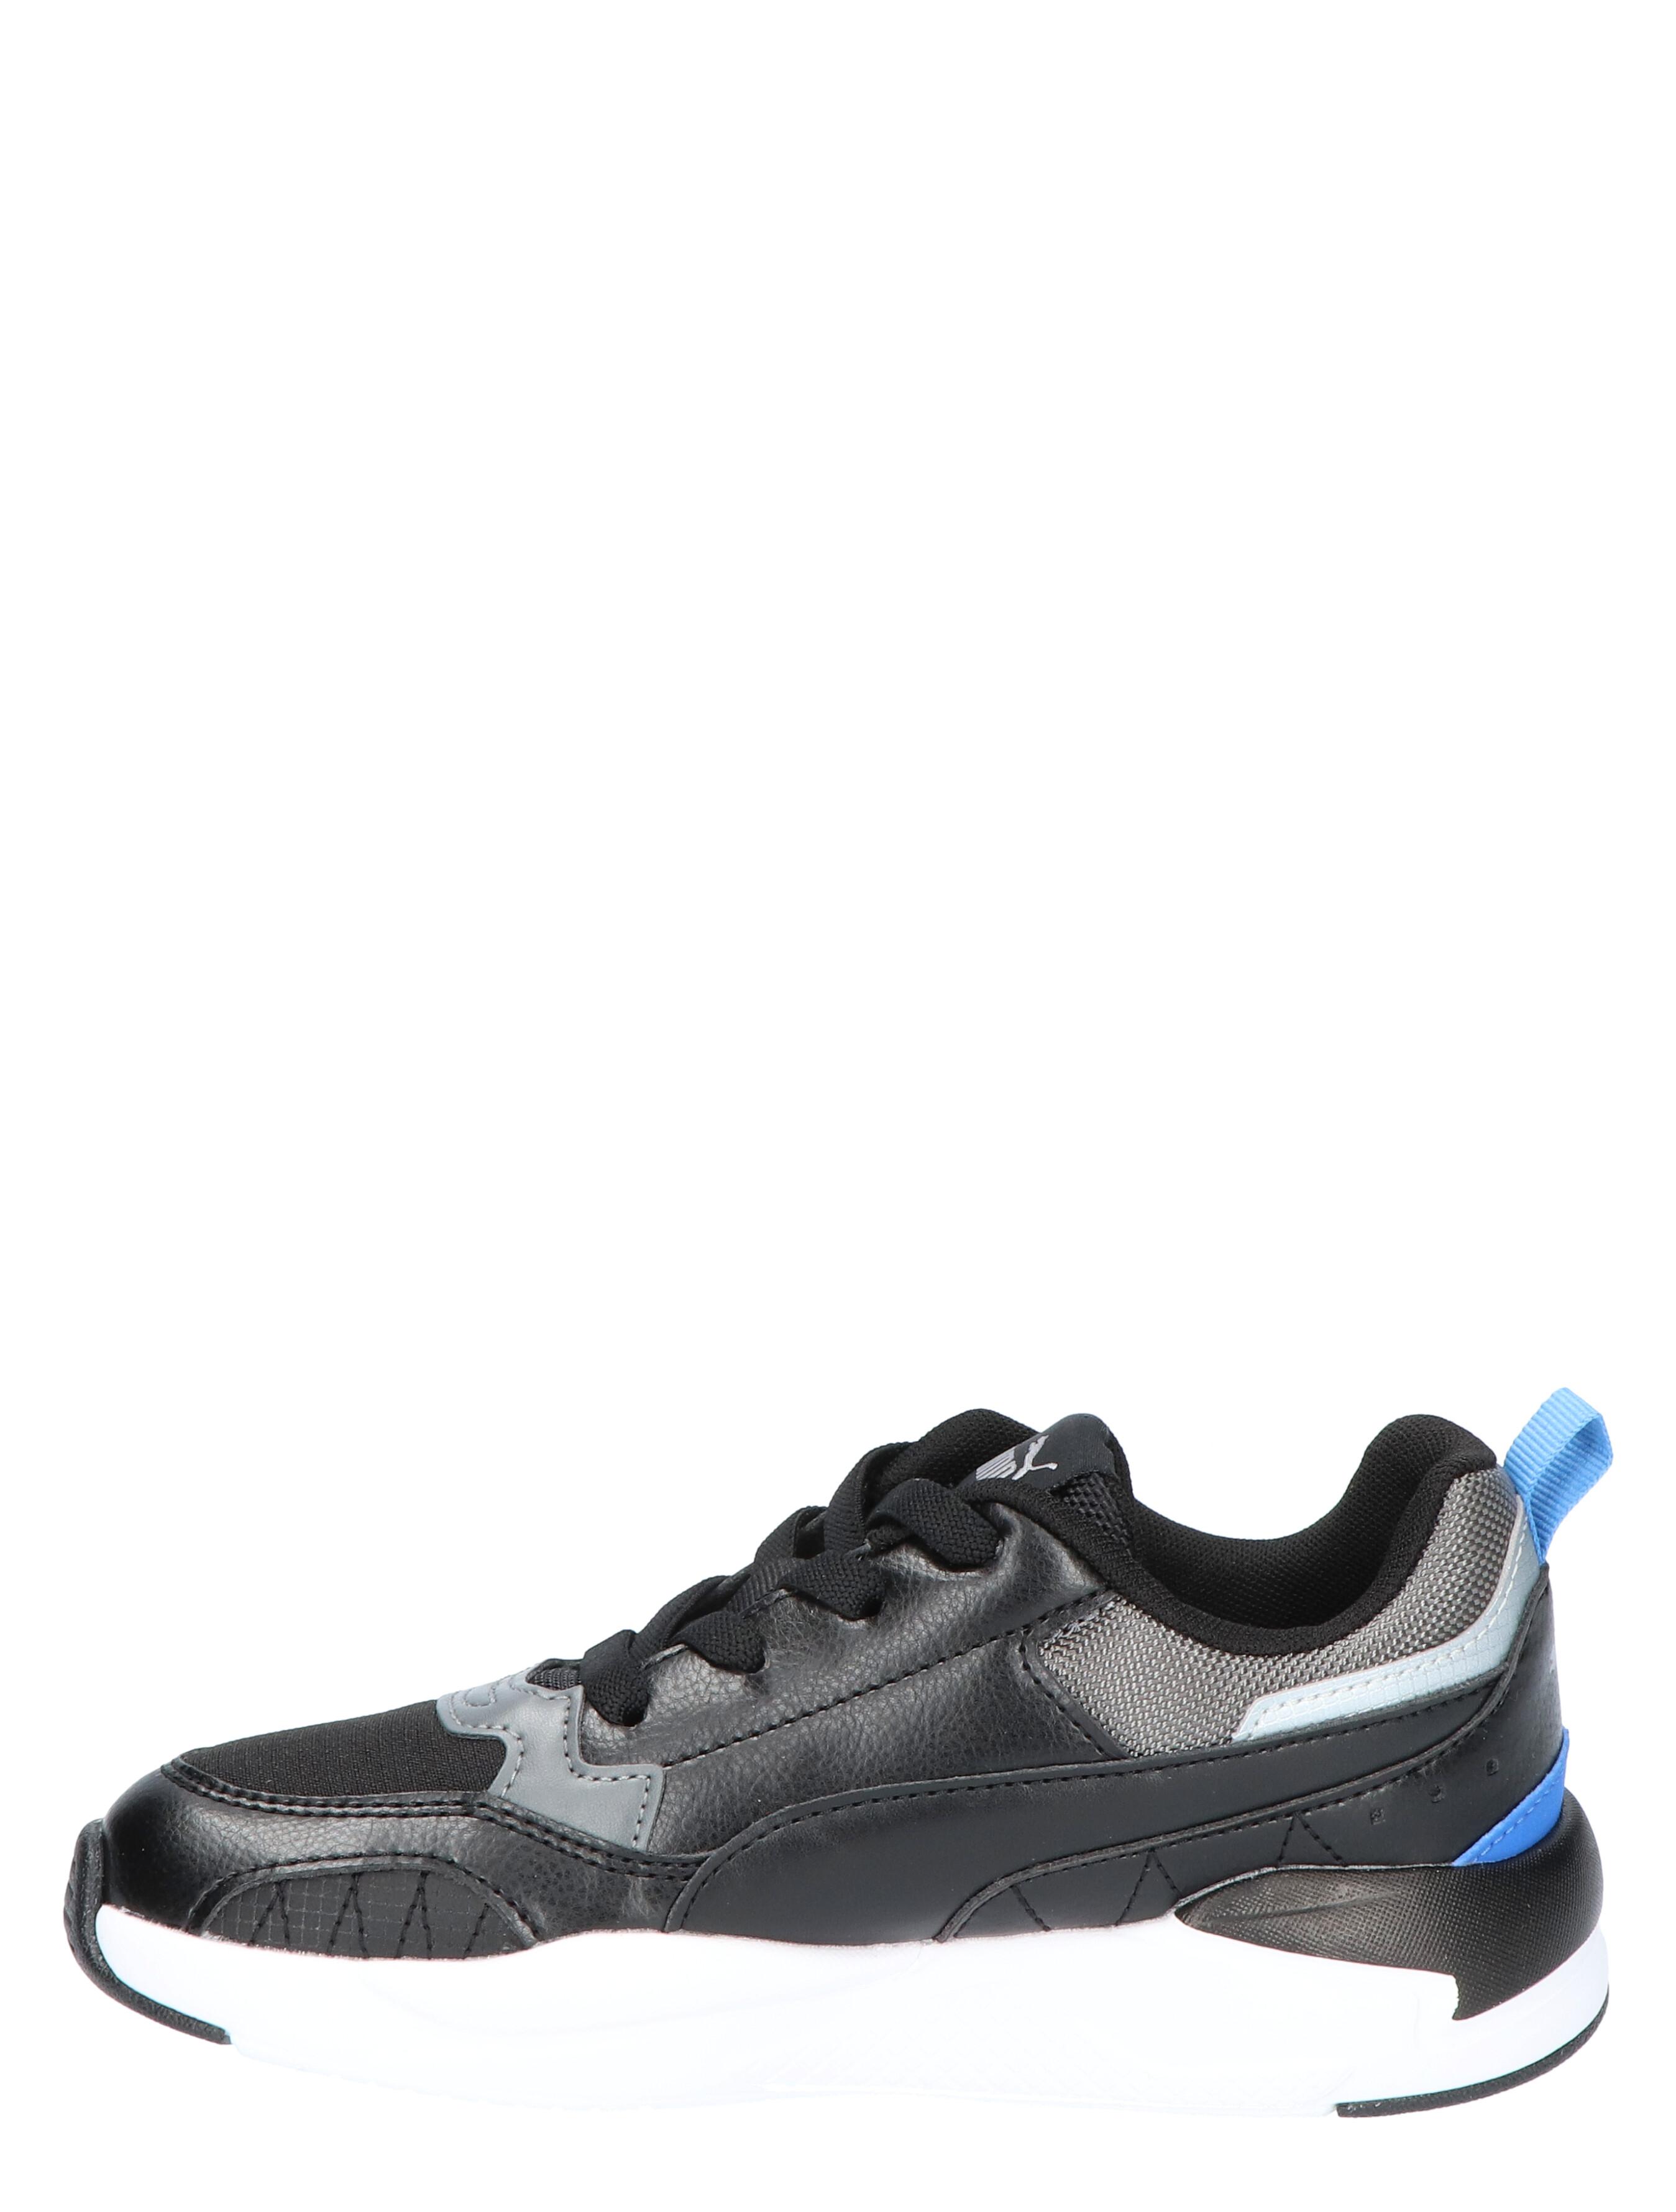 Puma X-Ray 2 Square Black Sneakers